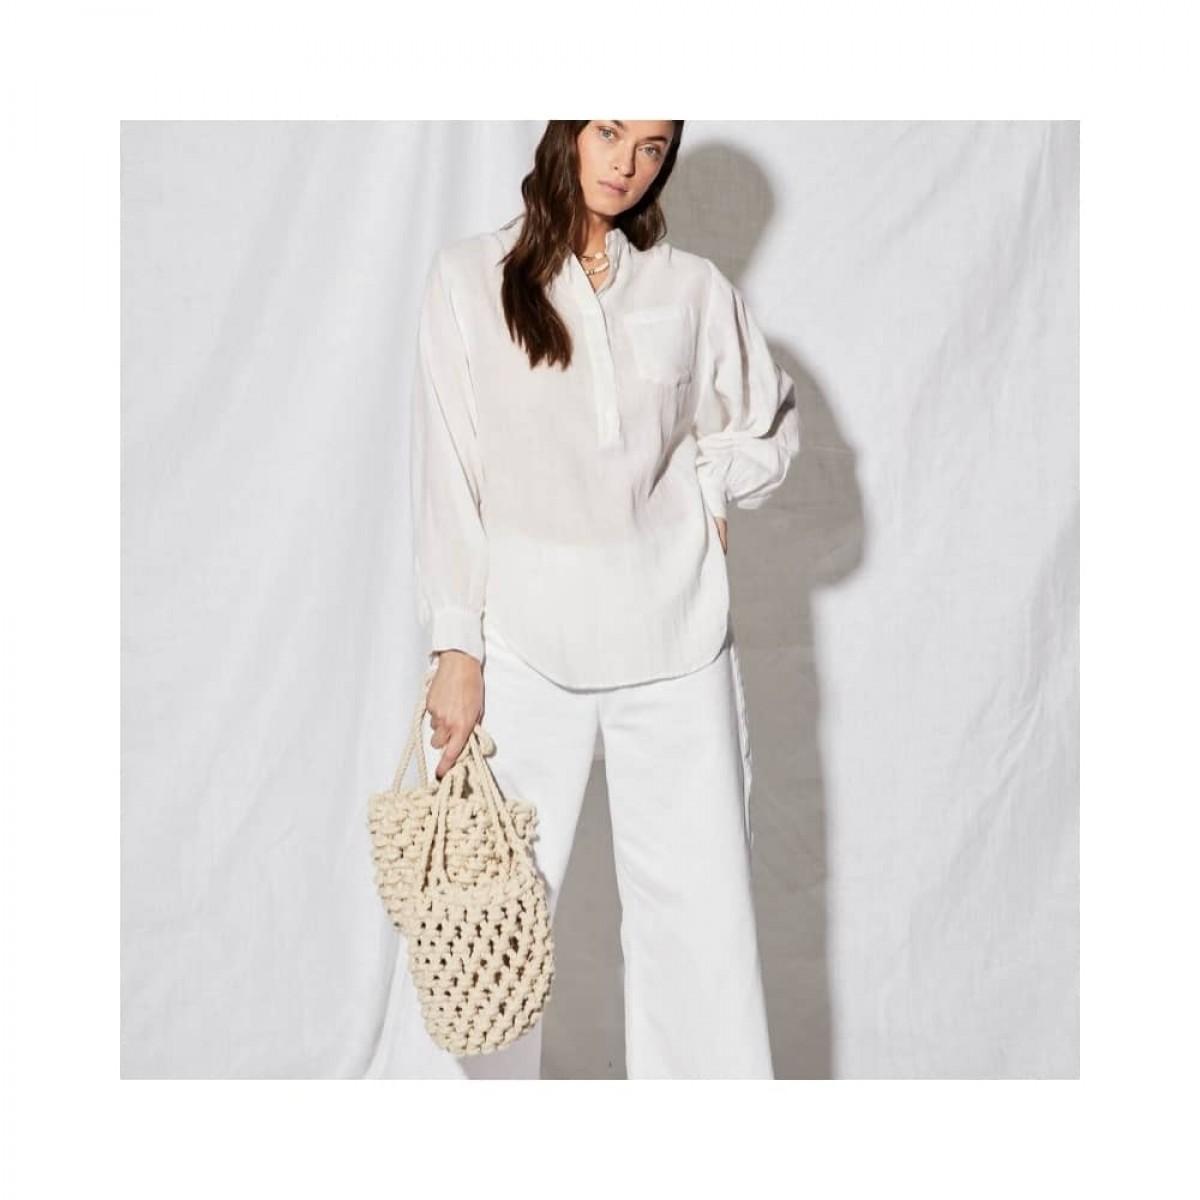 litonya skjorte - white